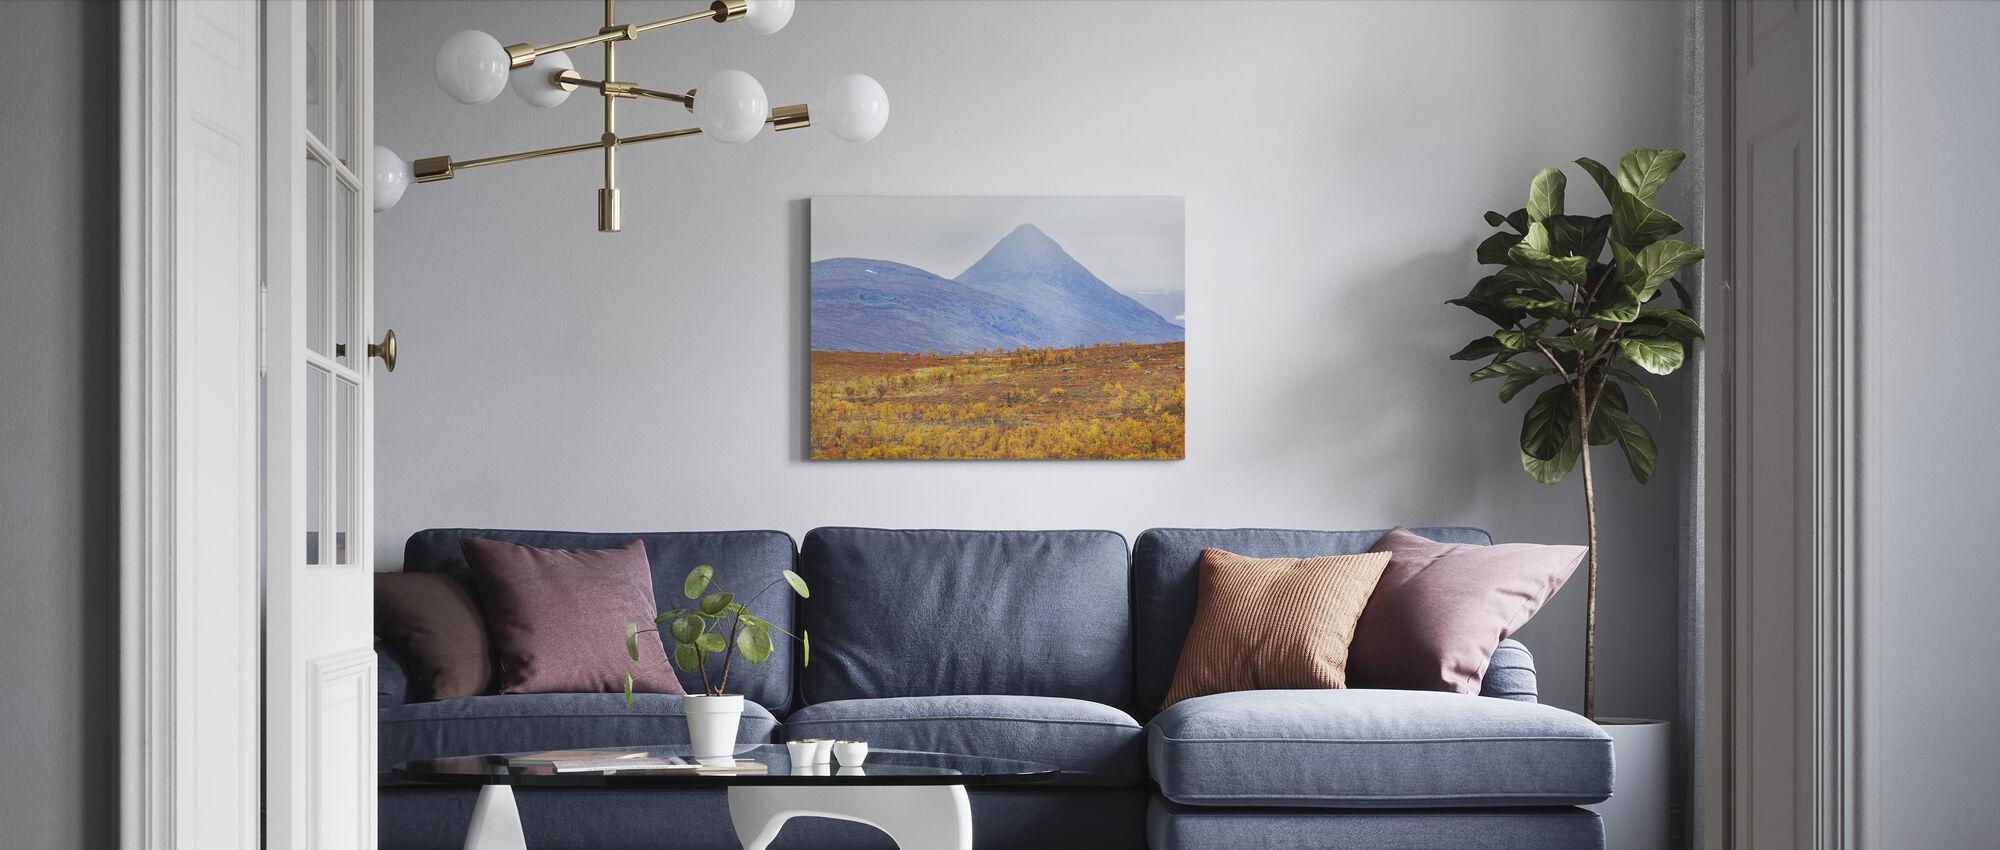 Autumn Saltoluokta Mountains - Canvas print - Living Room